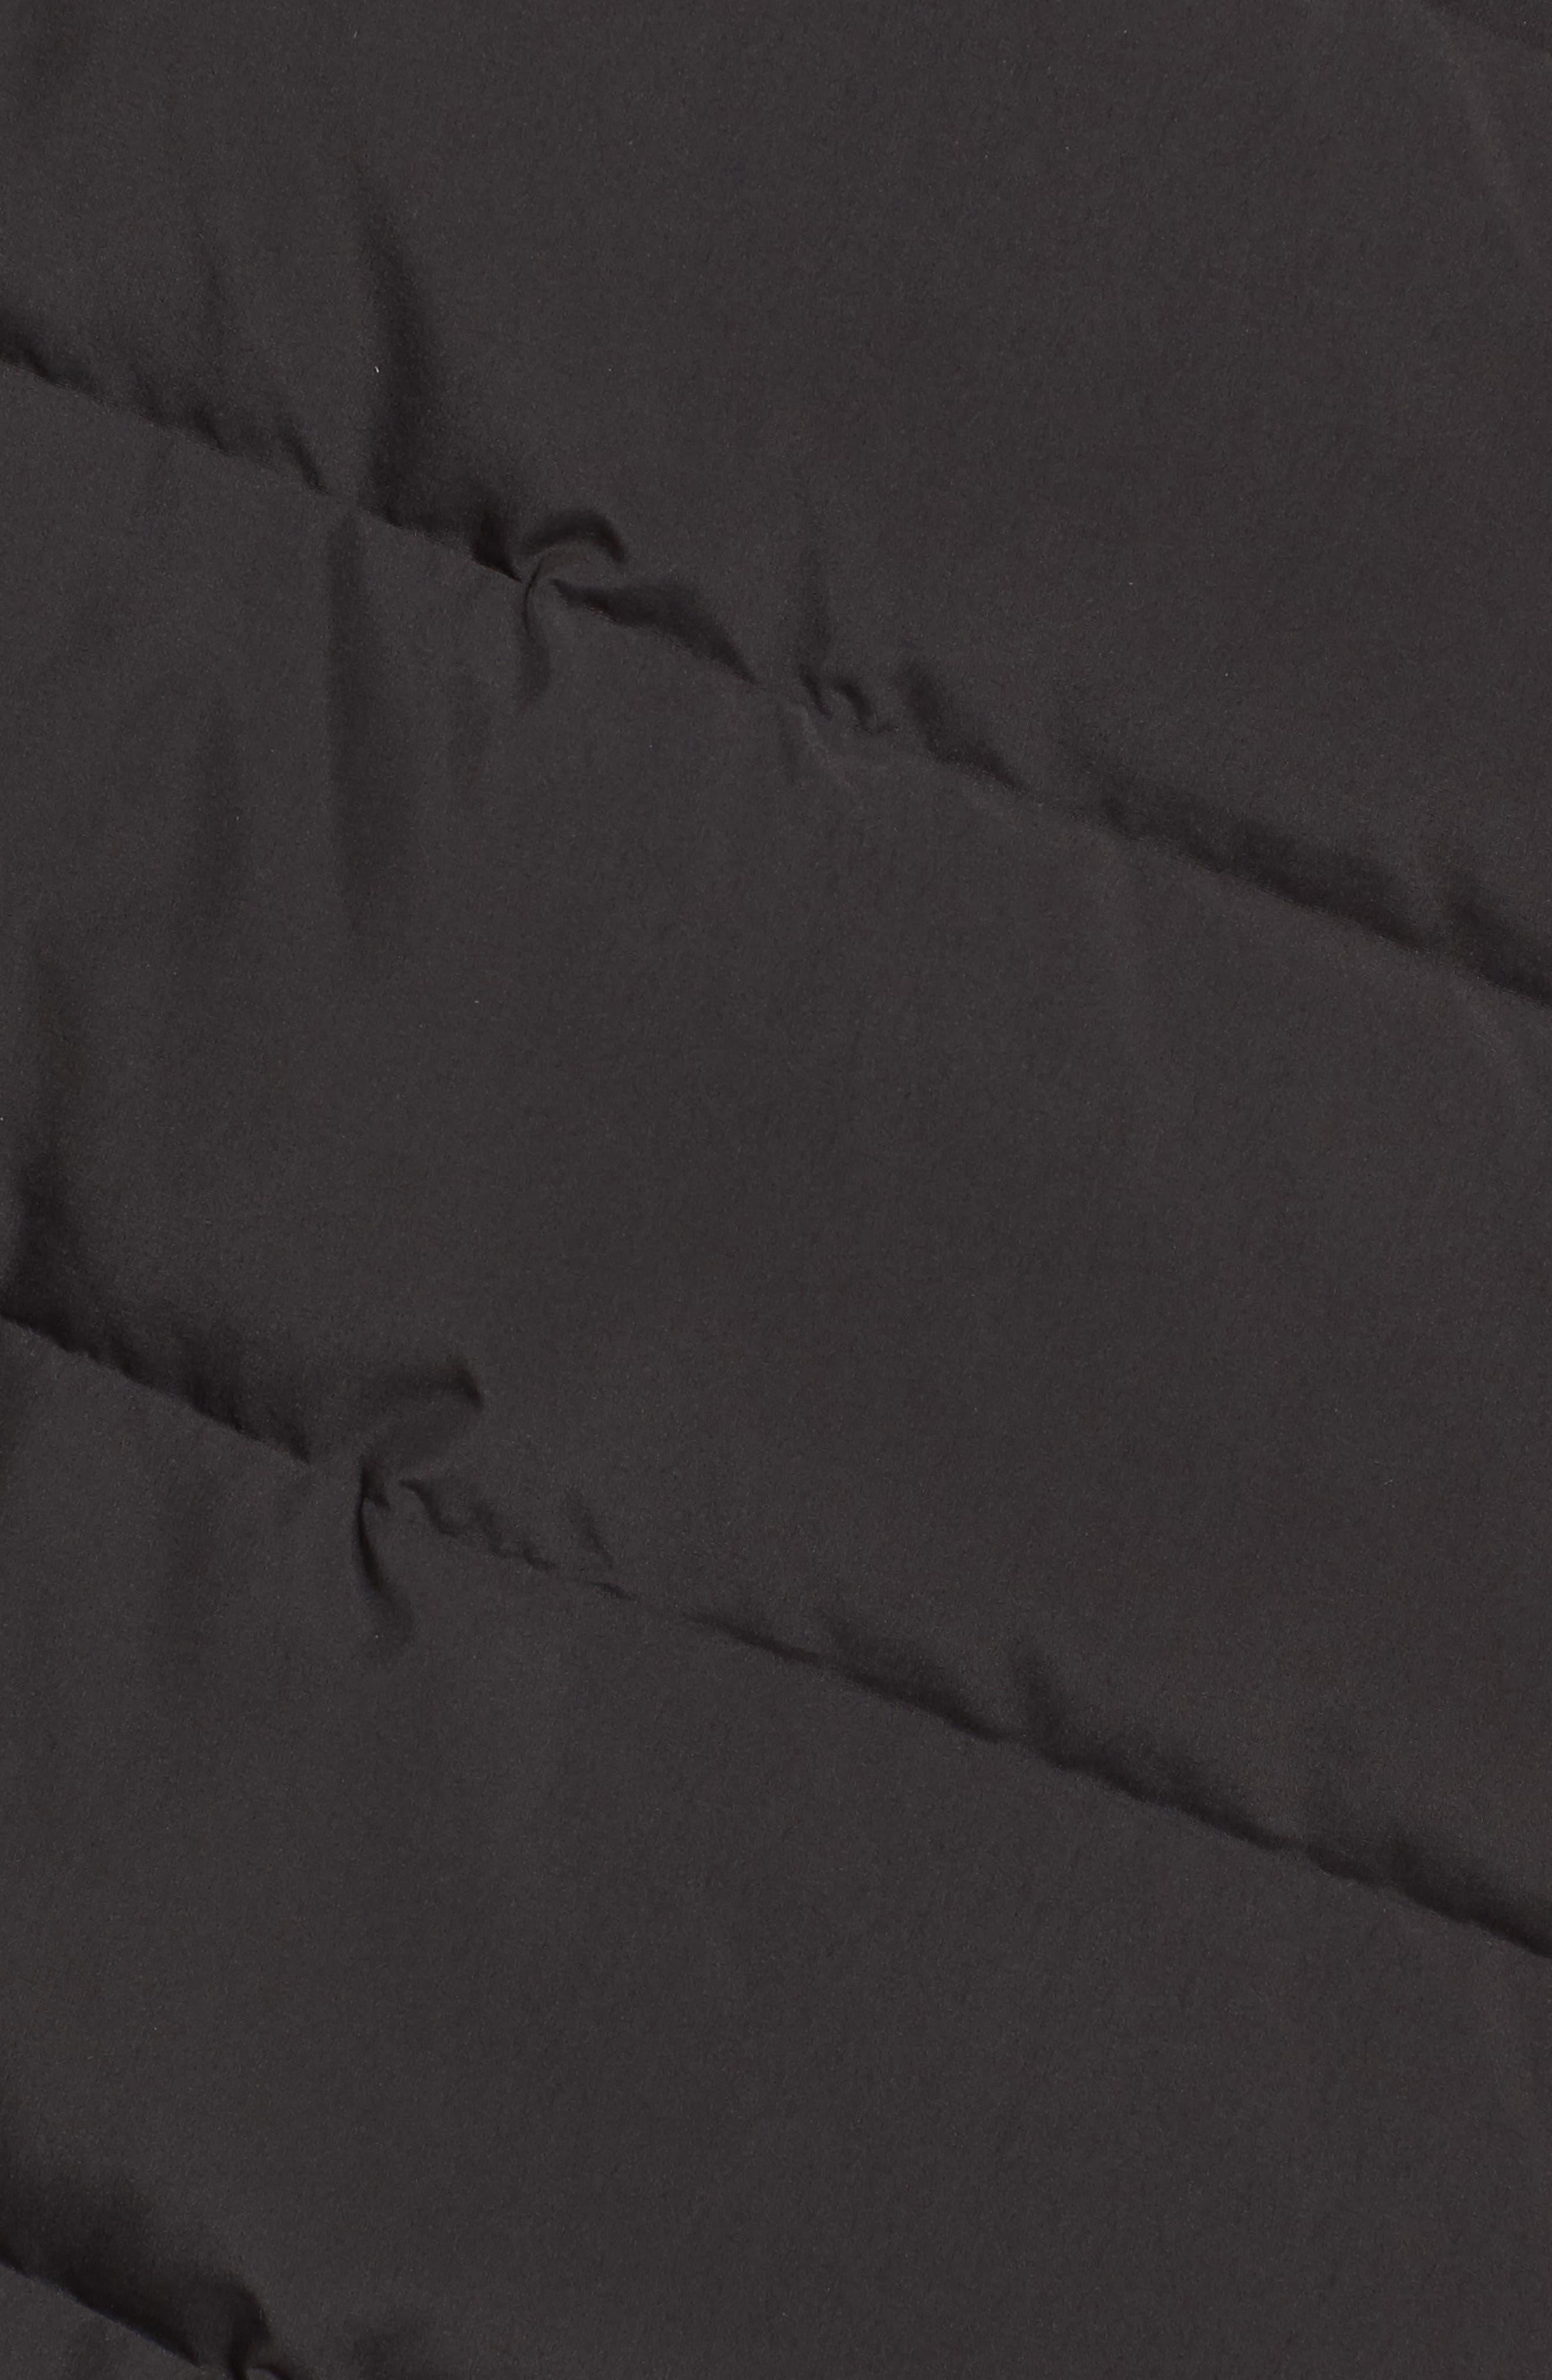 Syrround Down Vest,                             Alternate thumbnail 6, color,                             001